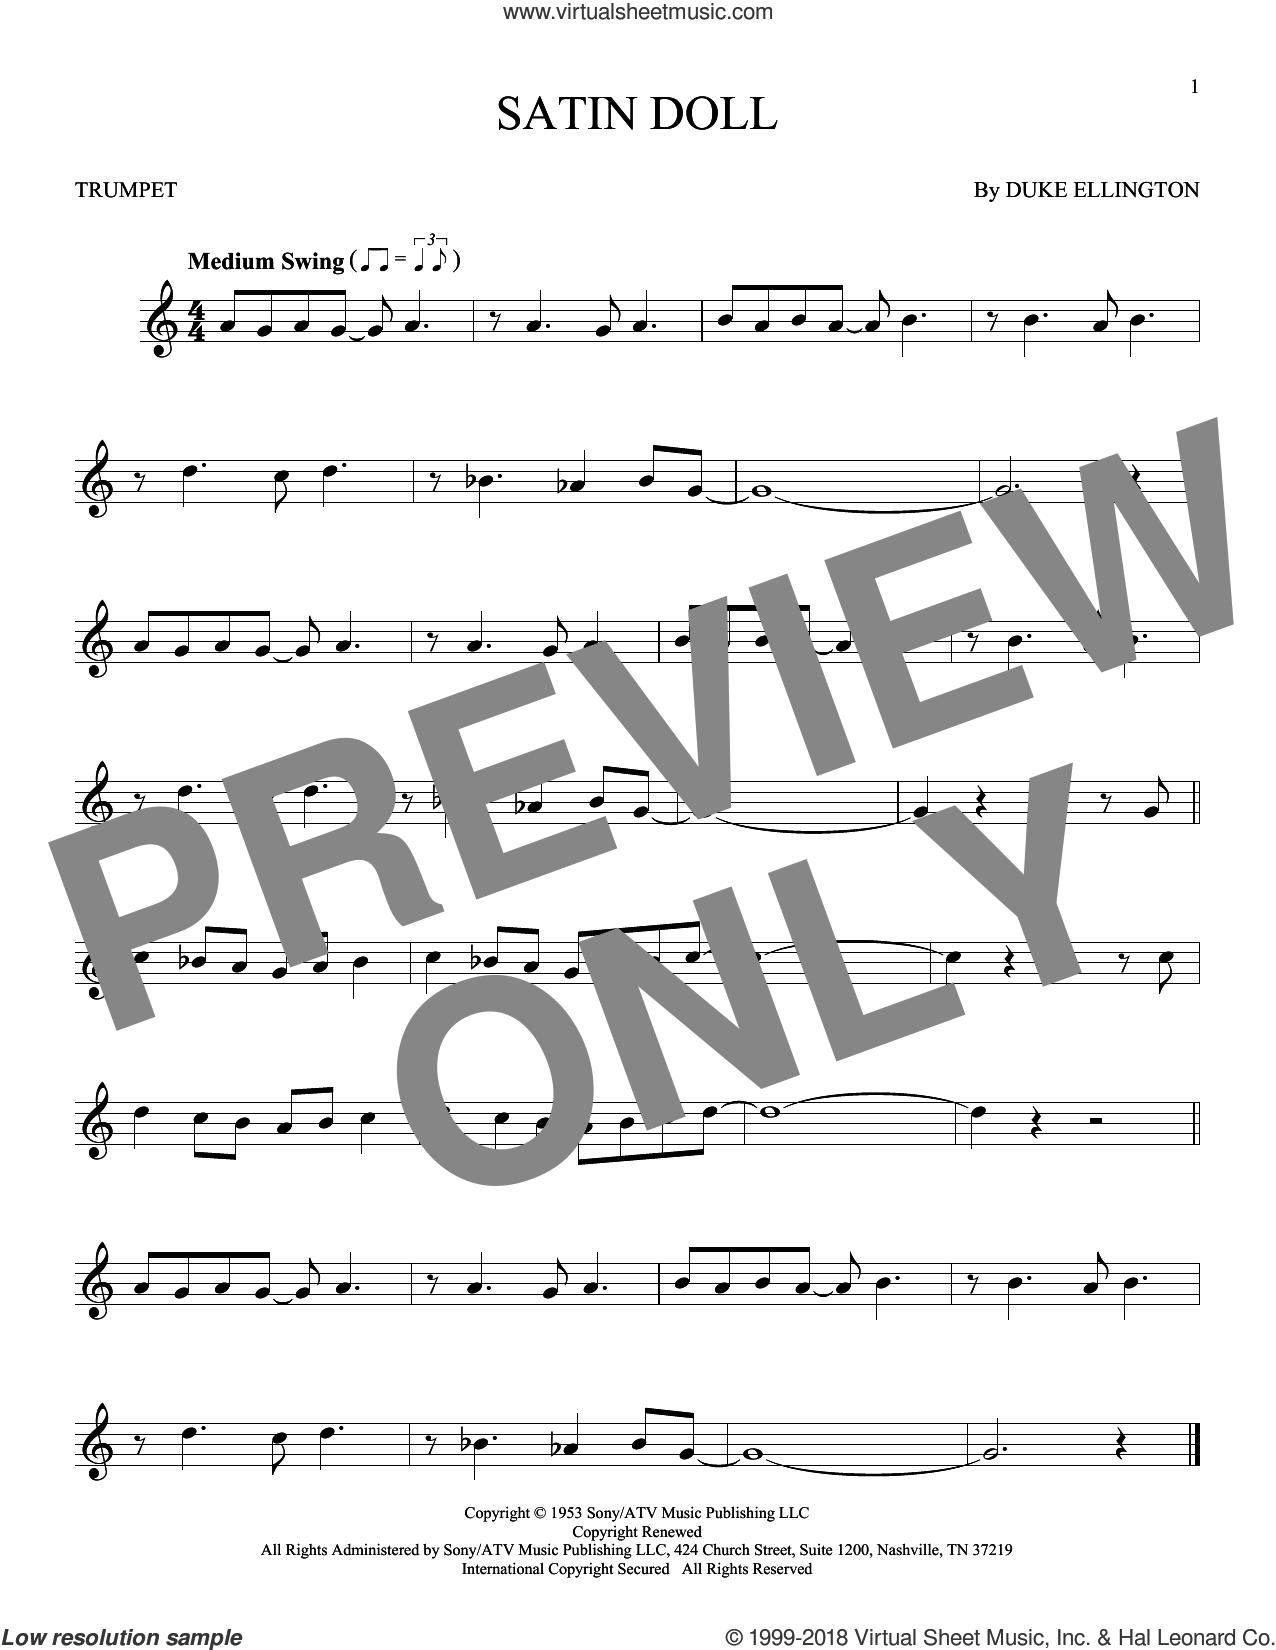 Duke Ellington Satin Doll Sheet Music - Imagez co